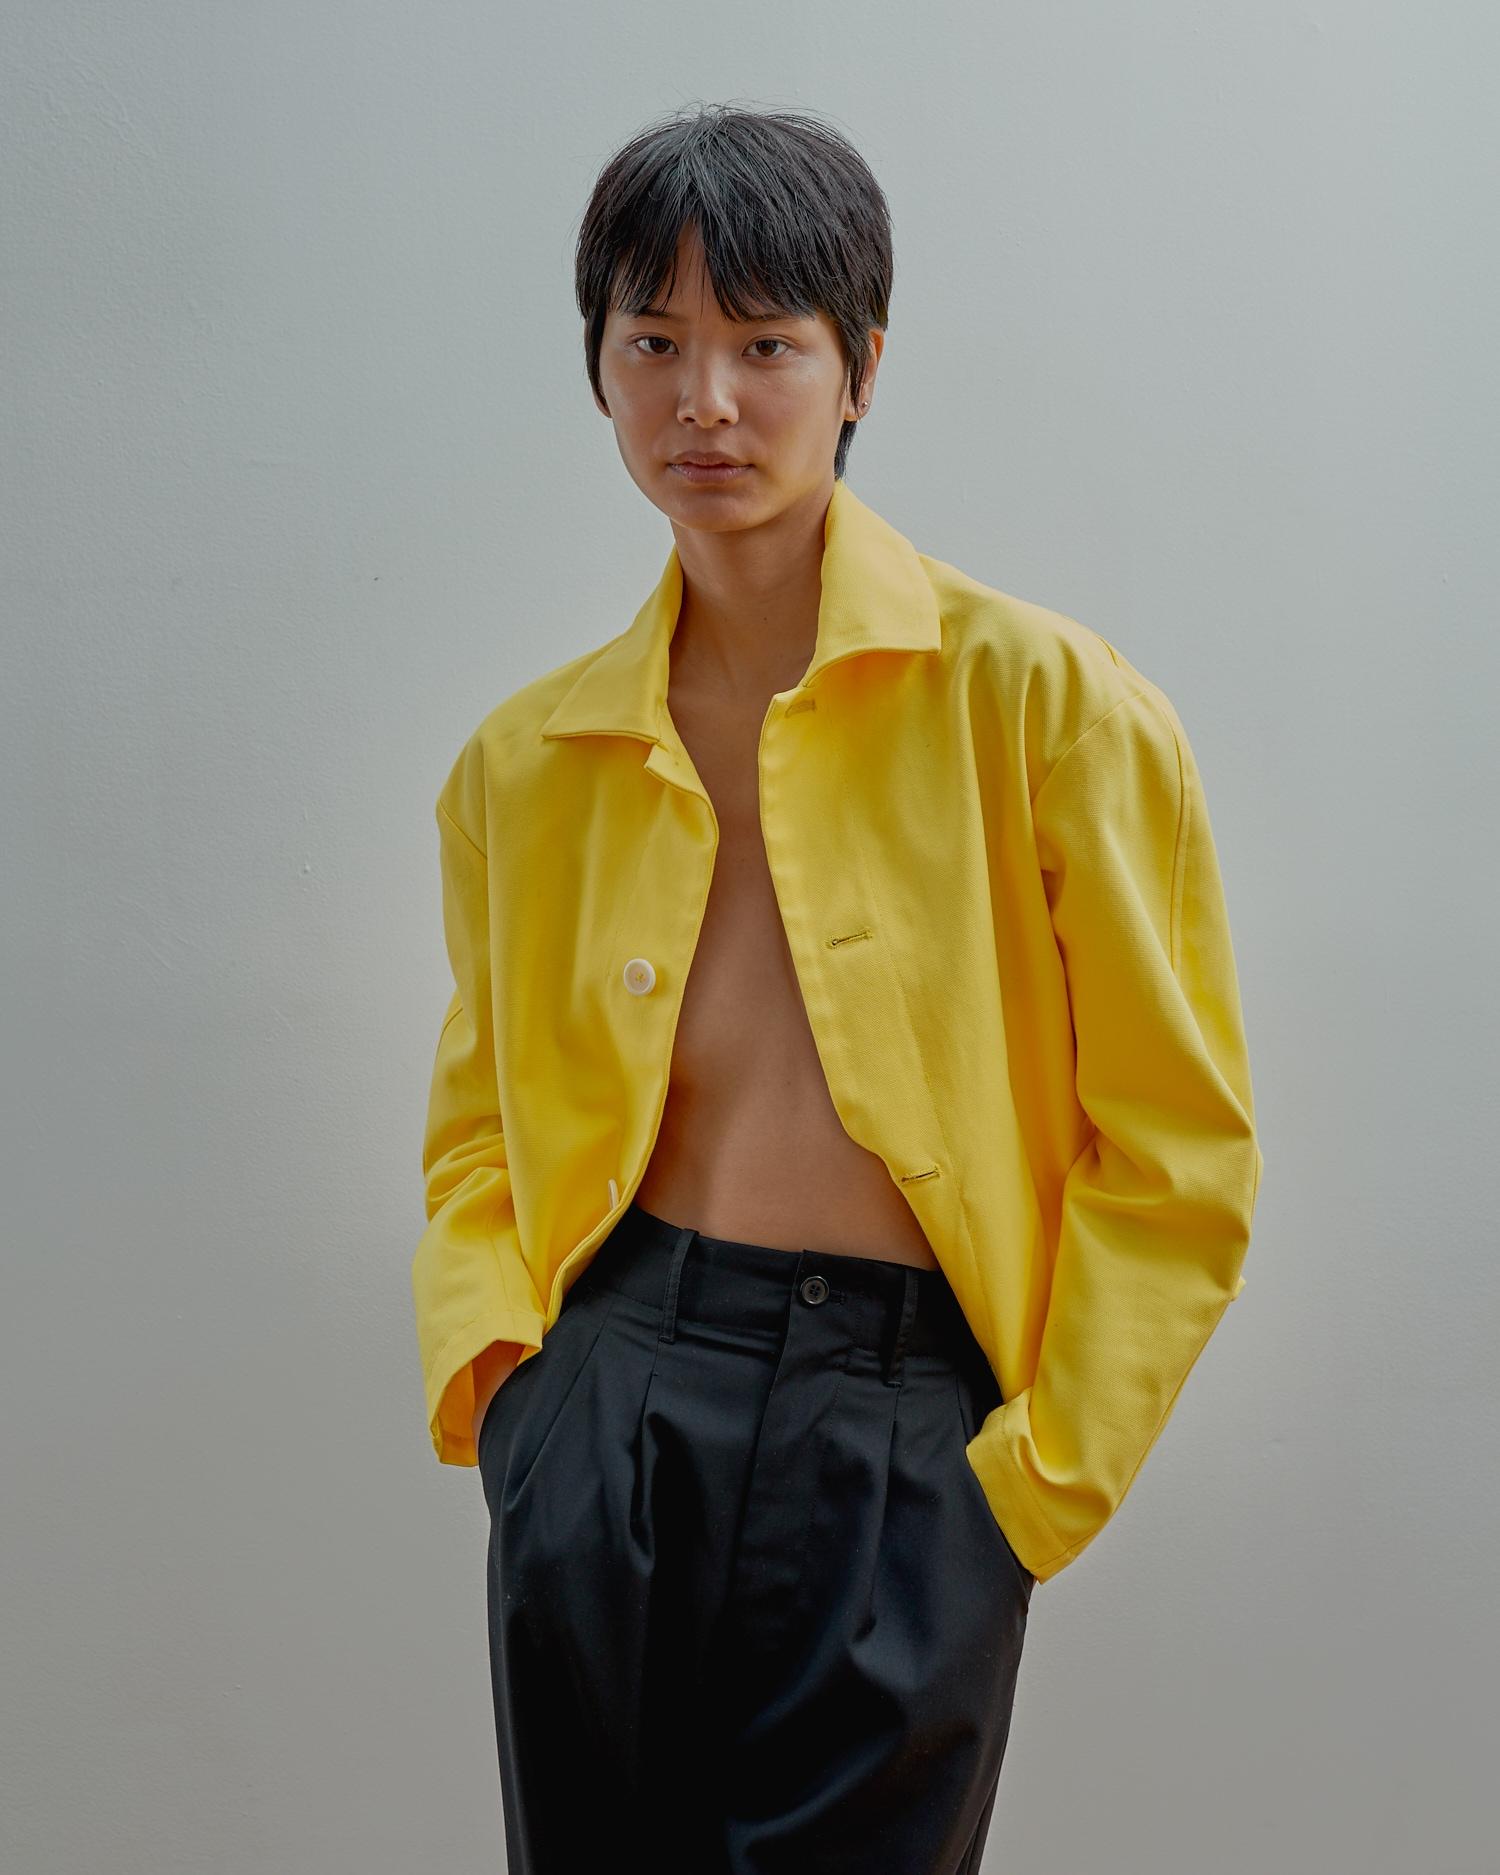 Shop Gender Neutral Apparel. Yellow Jacket.